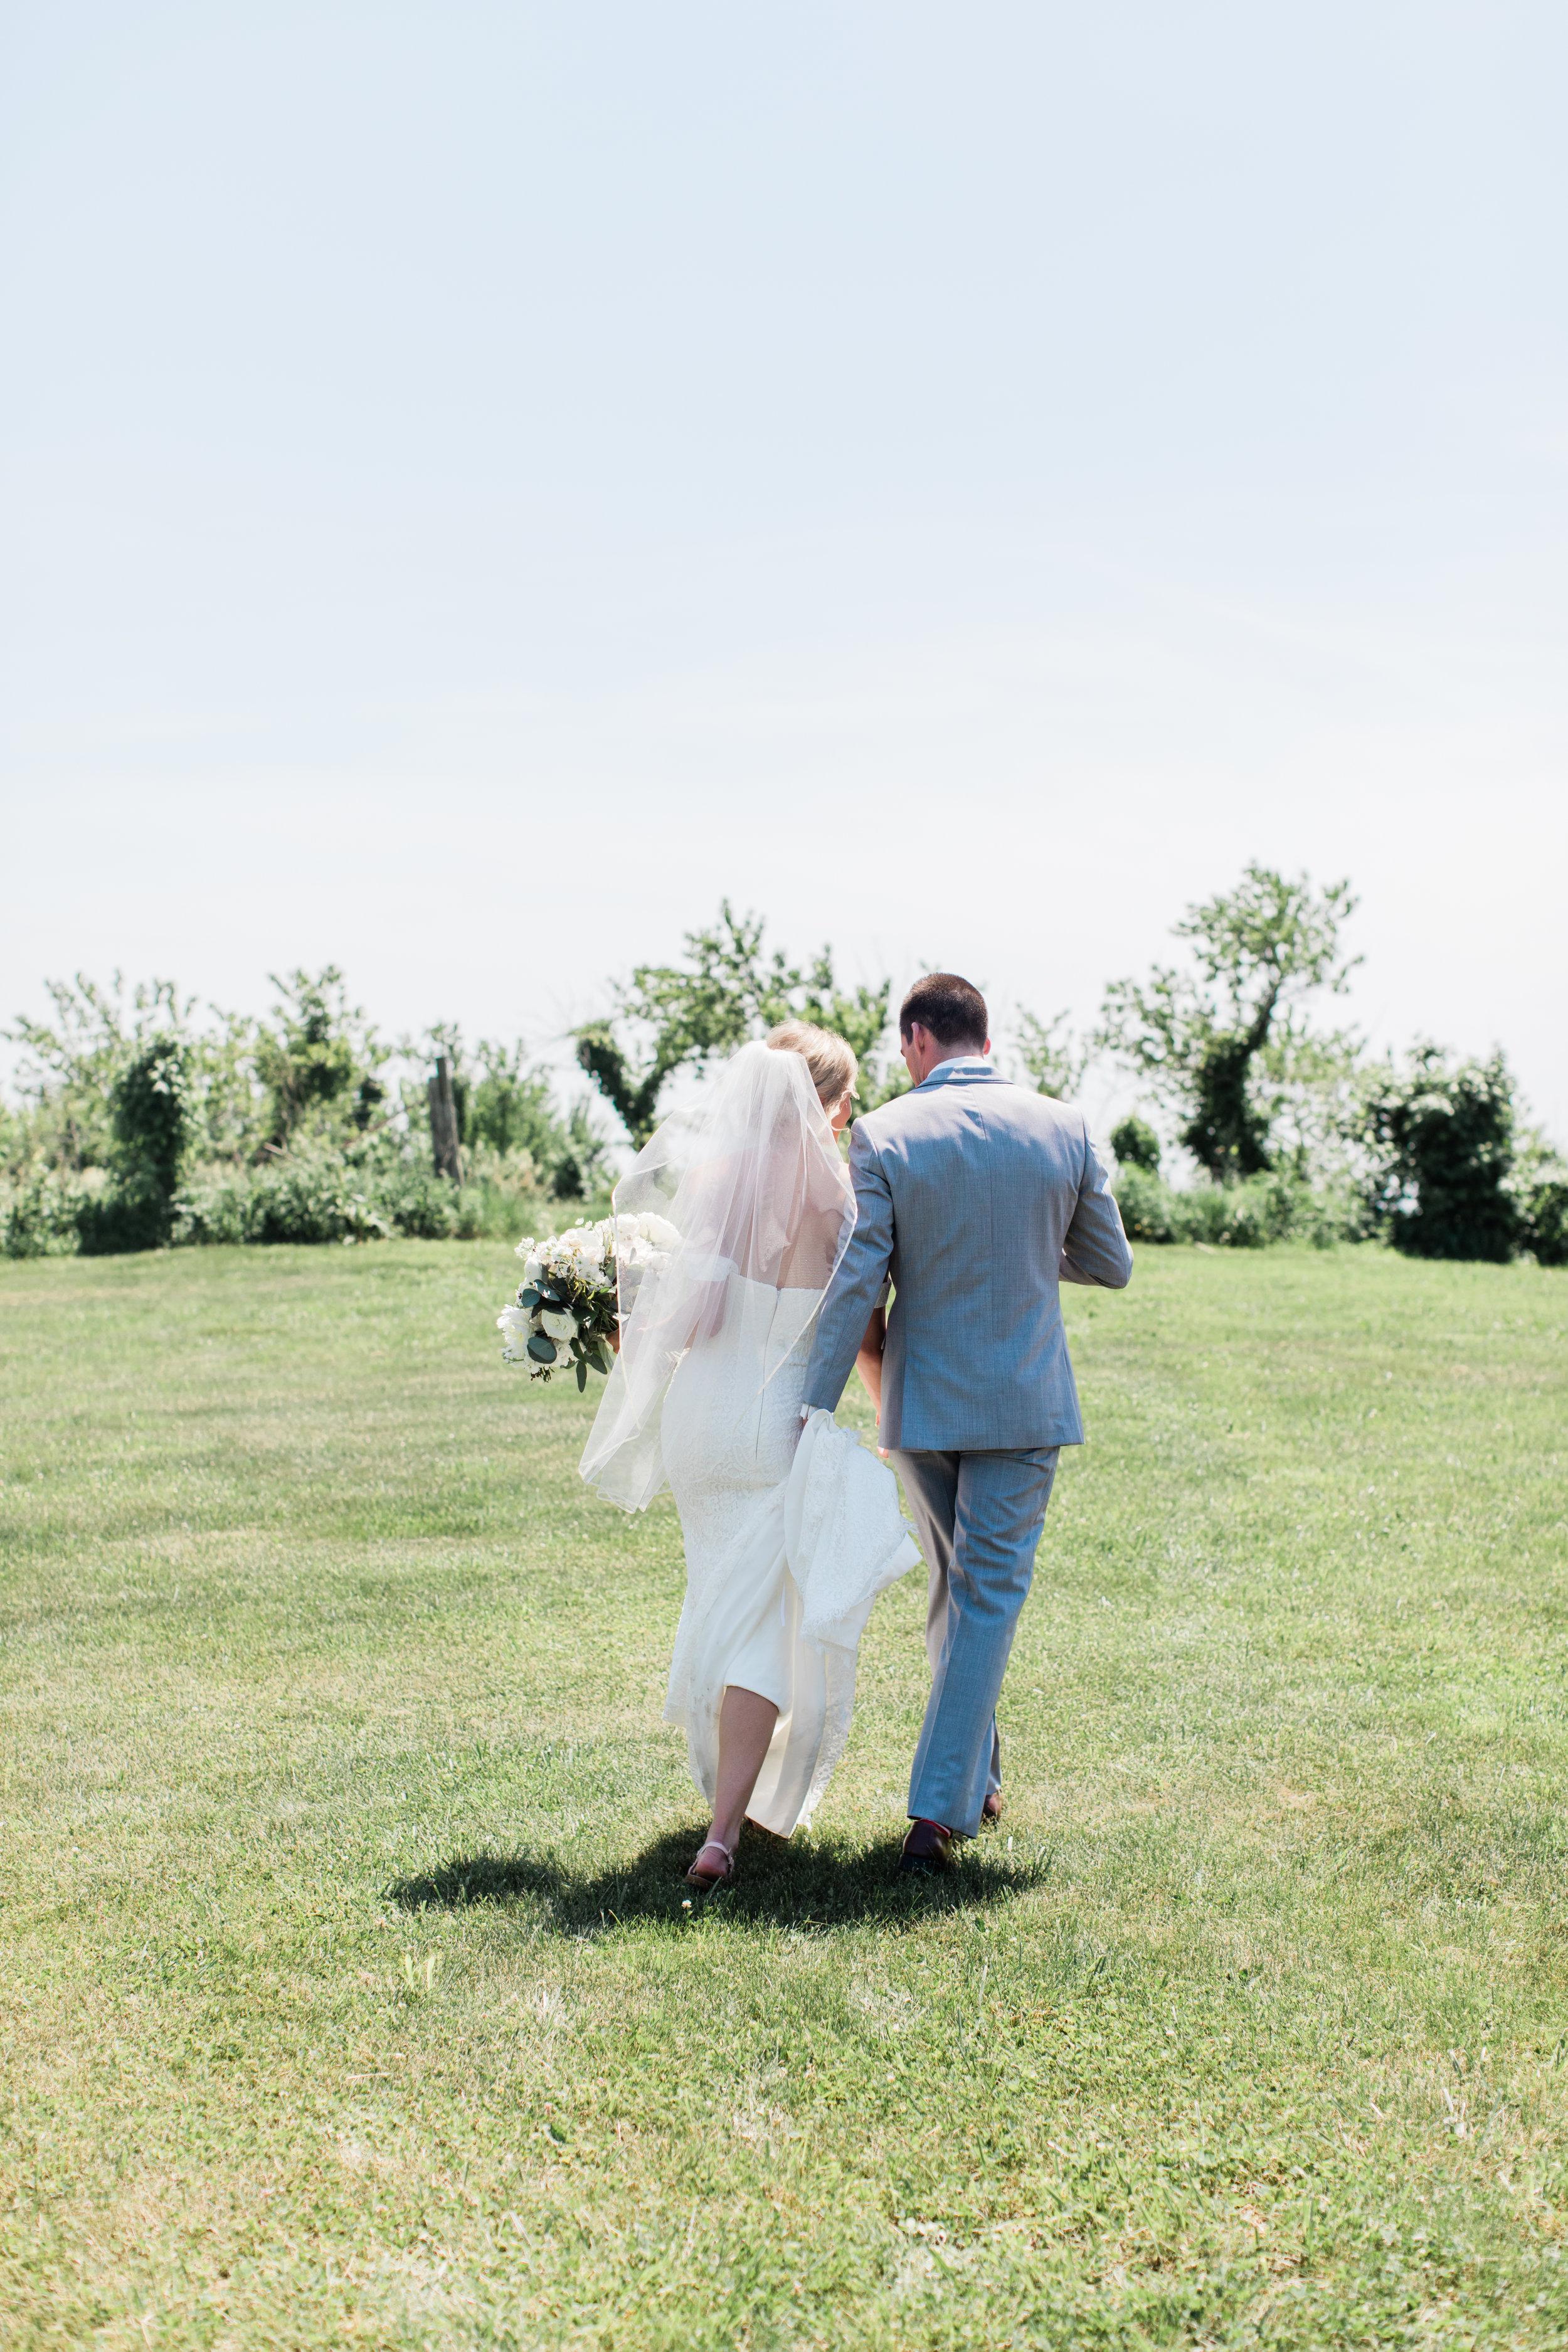 RHODES WEDDING - MARISSA CRIBBS PHOTOGRAPHY-184.jpg